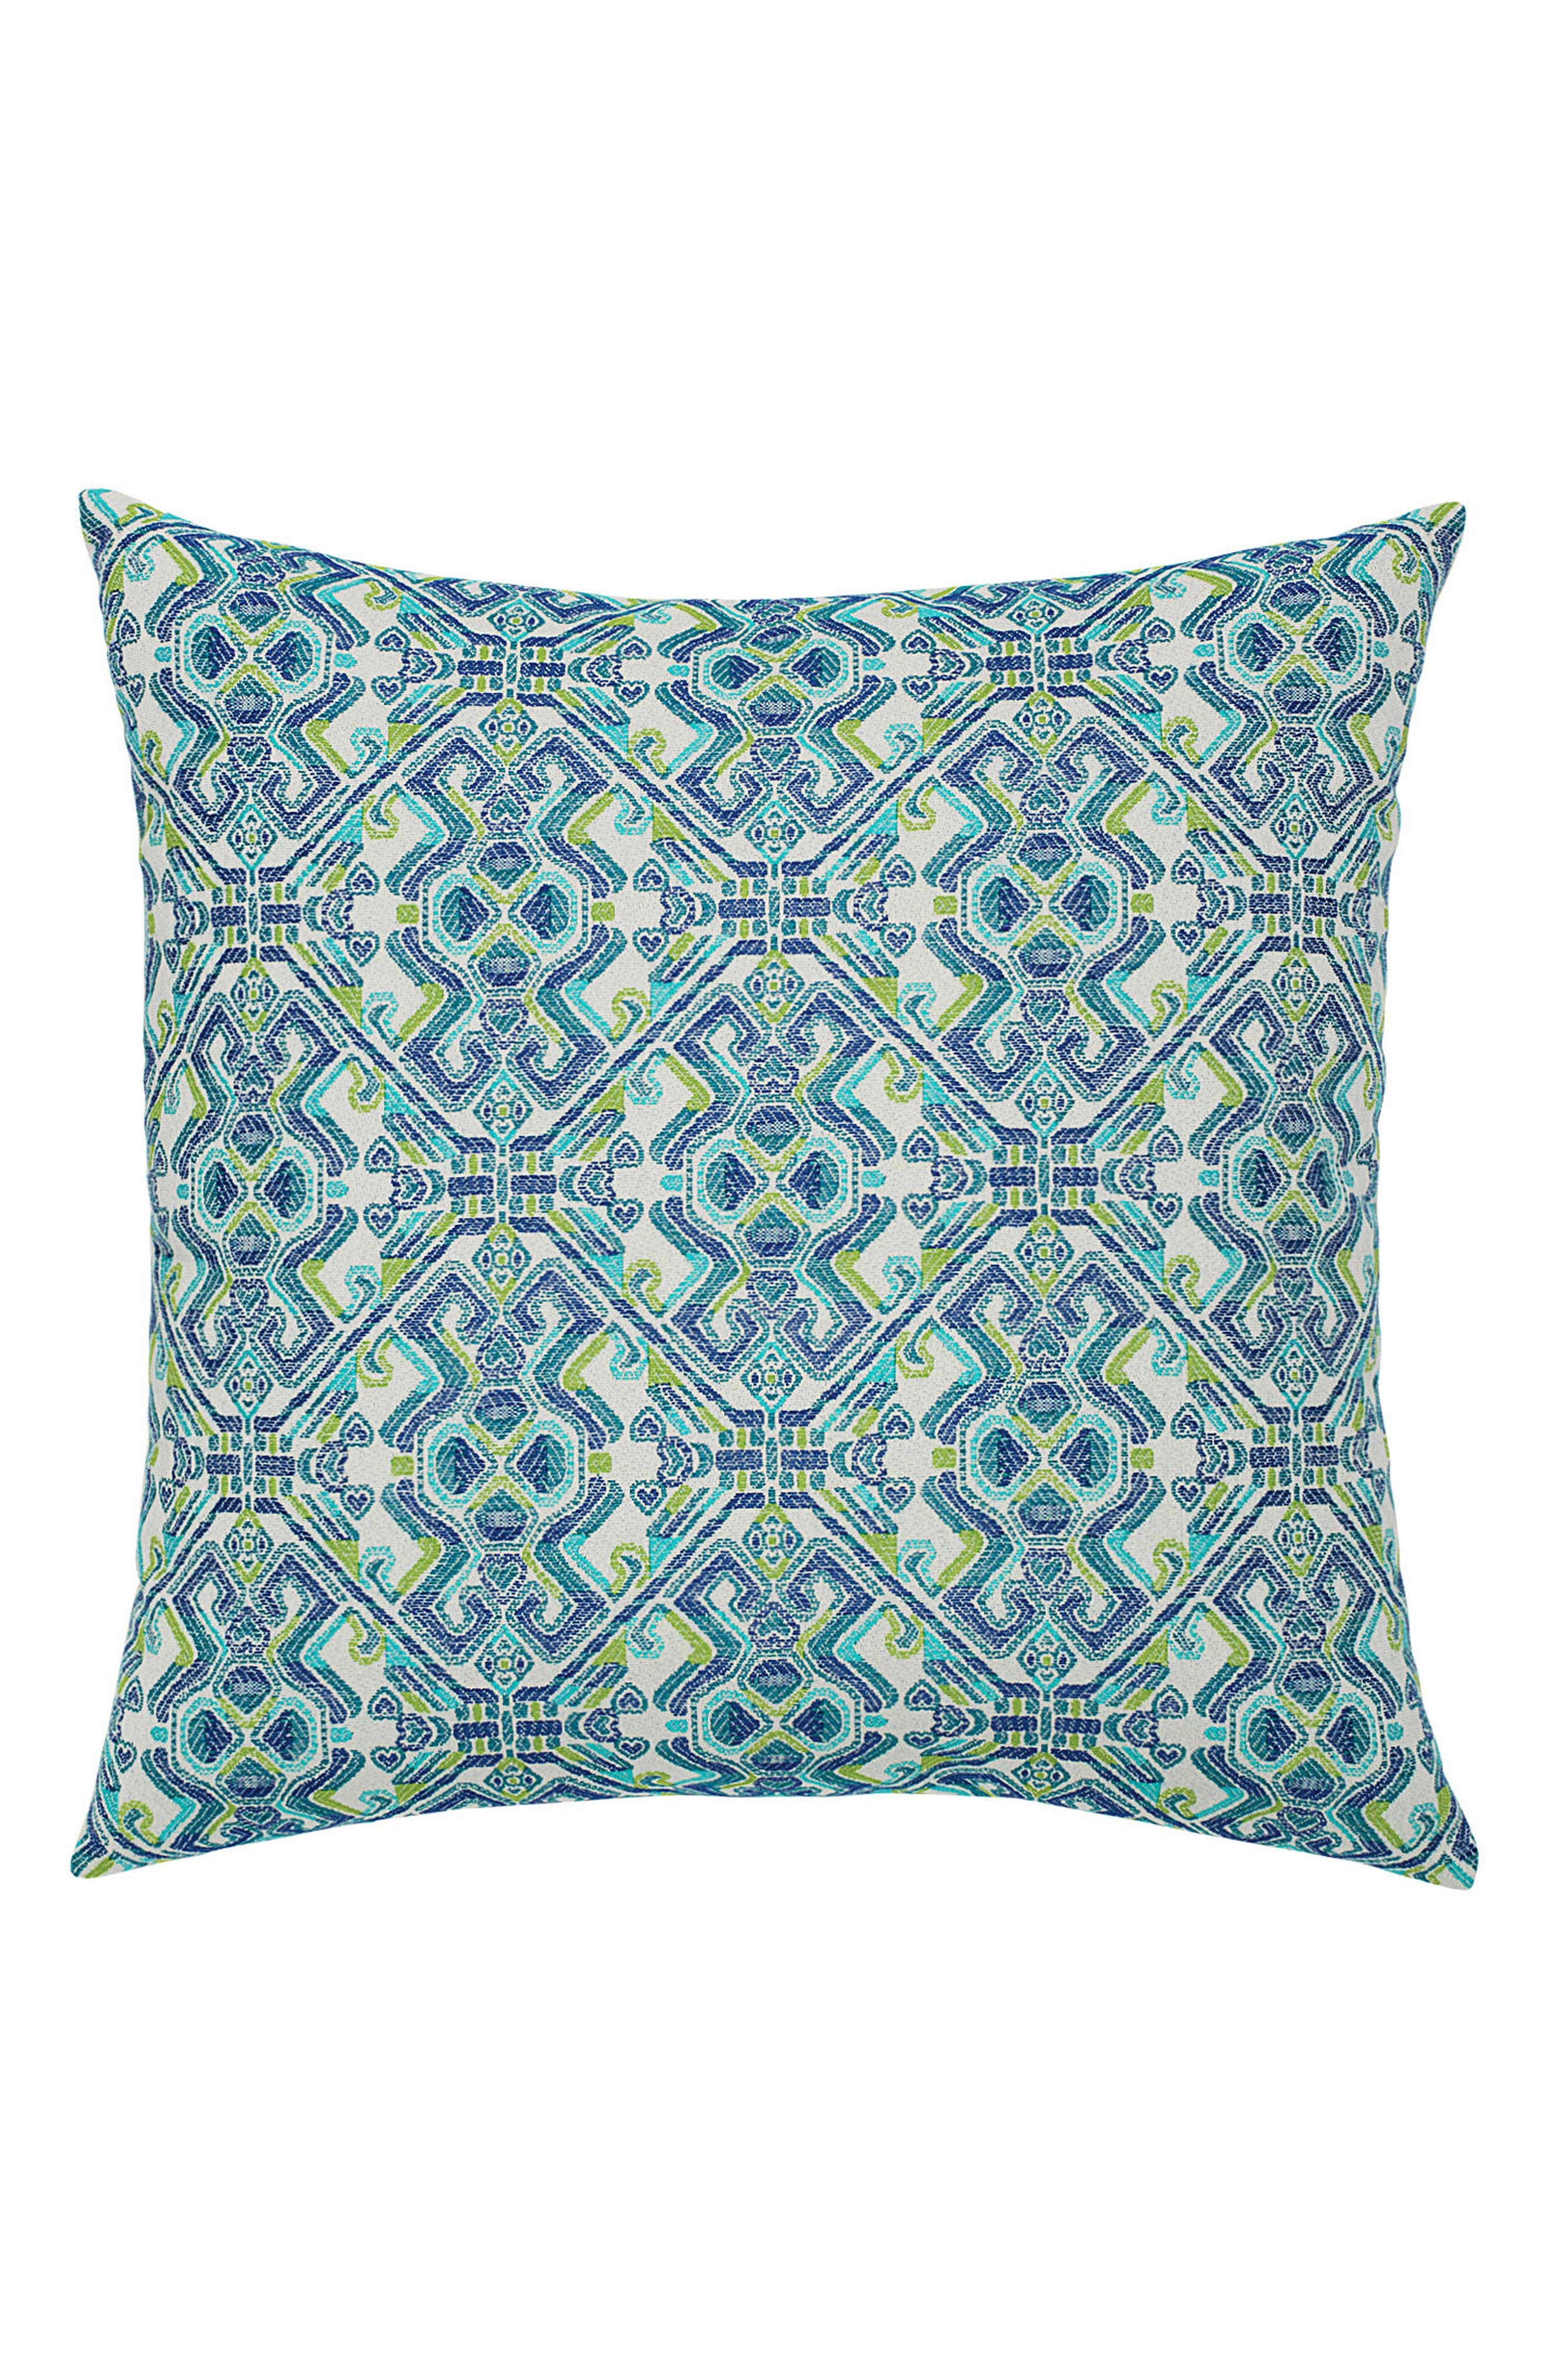 Delphi Indoor/Outdoor Accent Pillow,                             Main thumbnail 1, color,                             BLUE MULTI